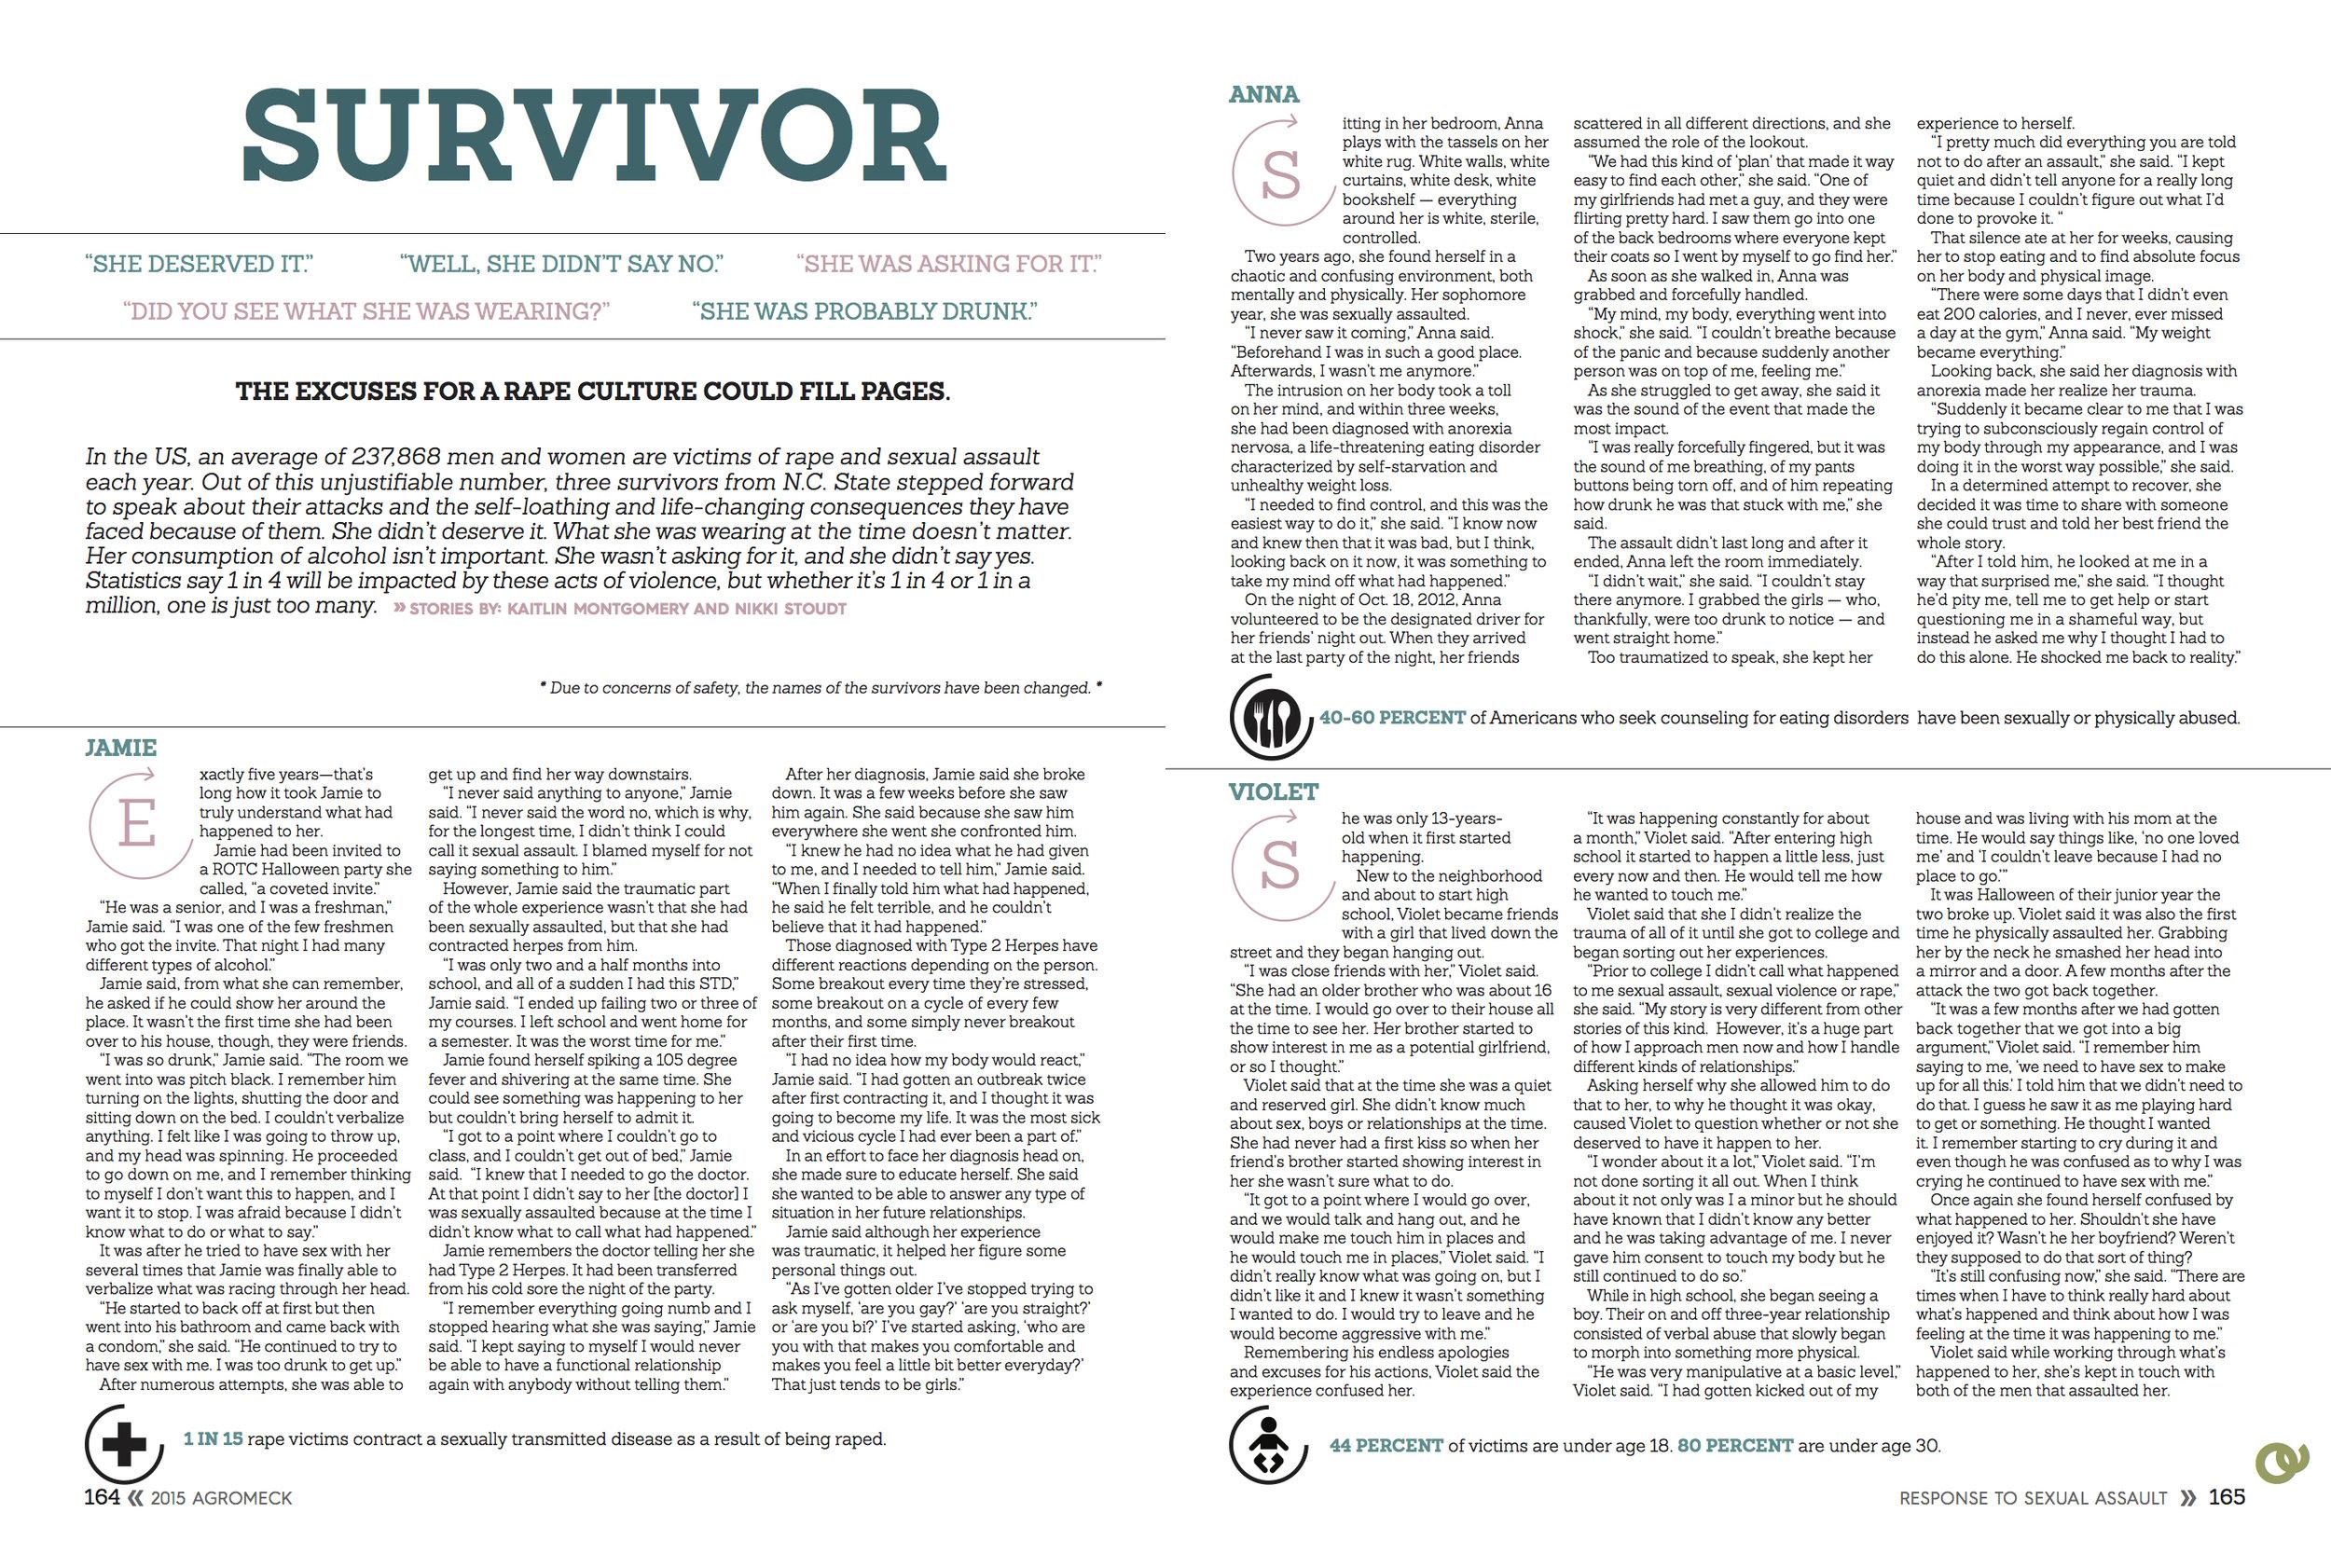 Sexual assault survivor stories